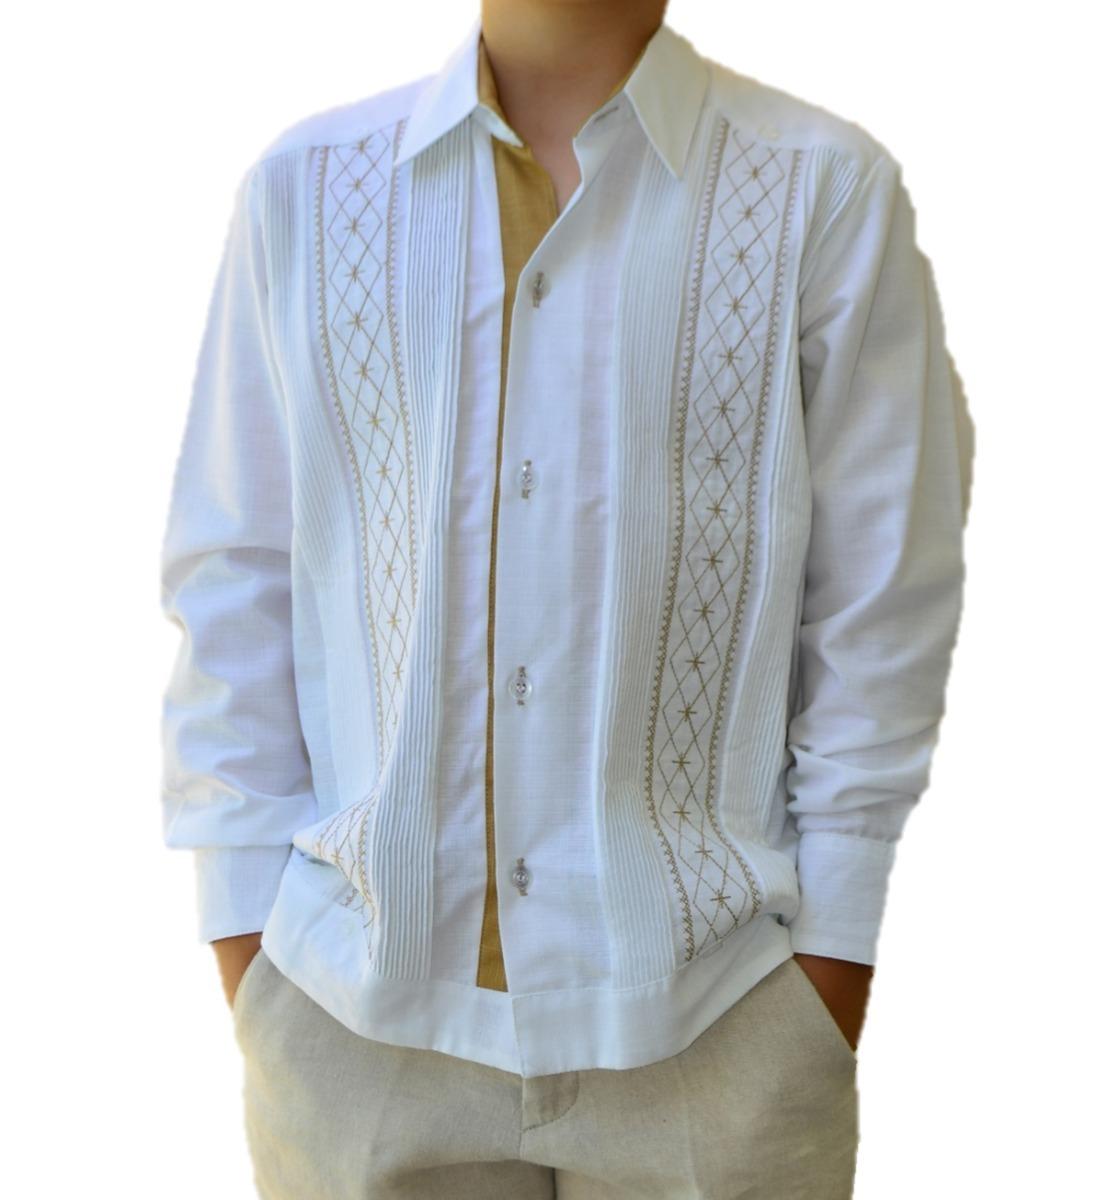 18a783a808 camisa guayabera yucateca casual lino niño  cfkjorn1221. Cargando zoom.